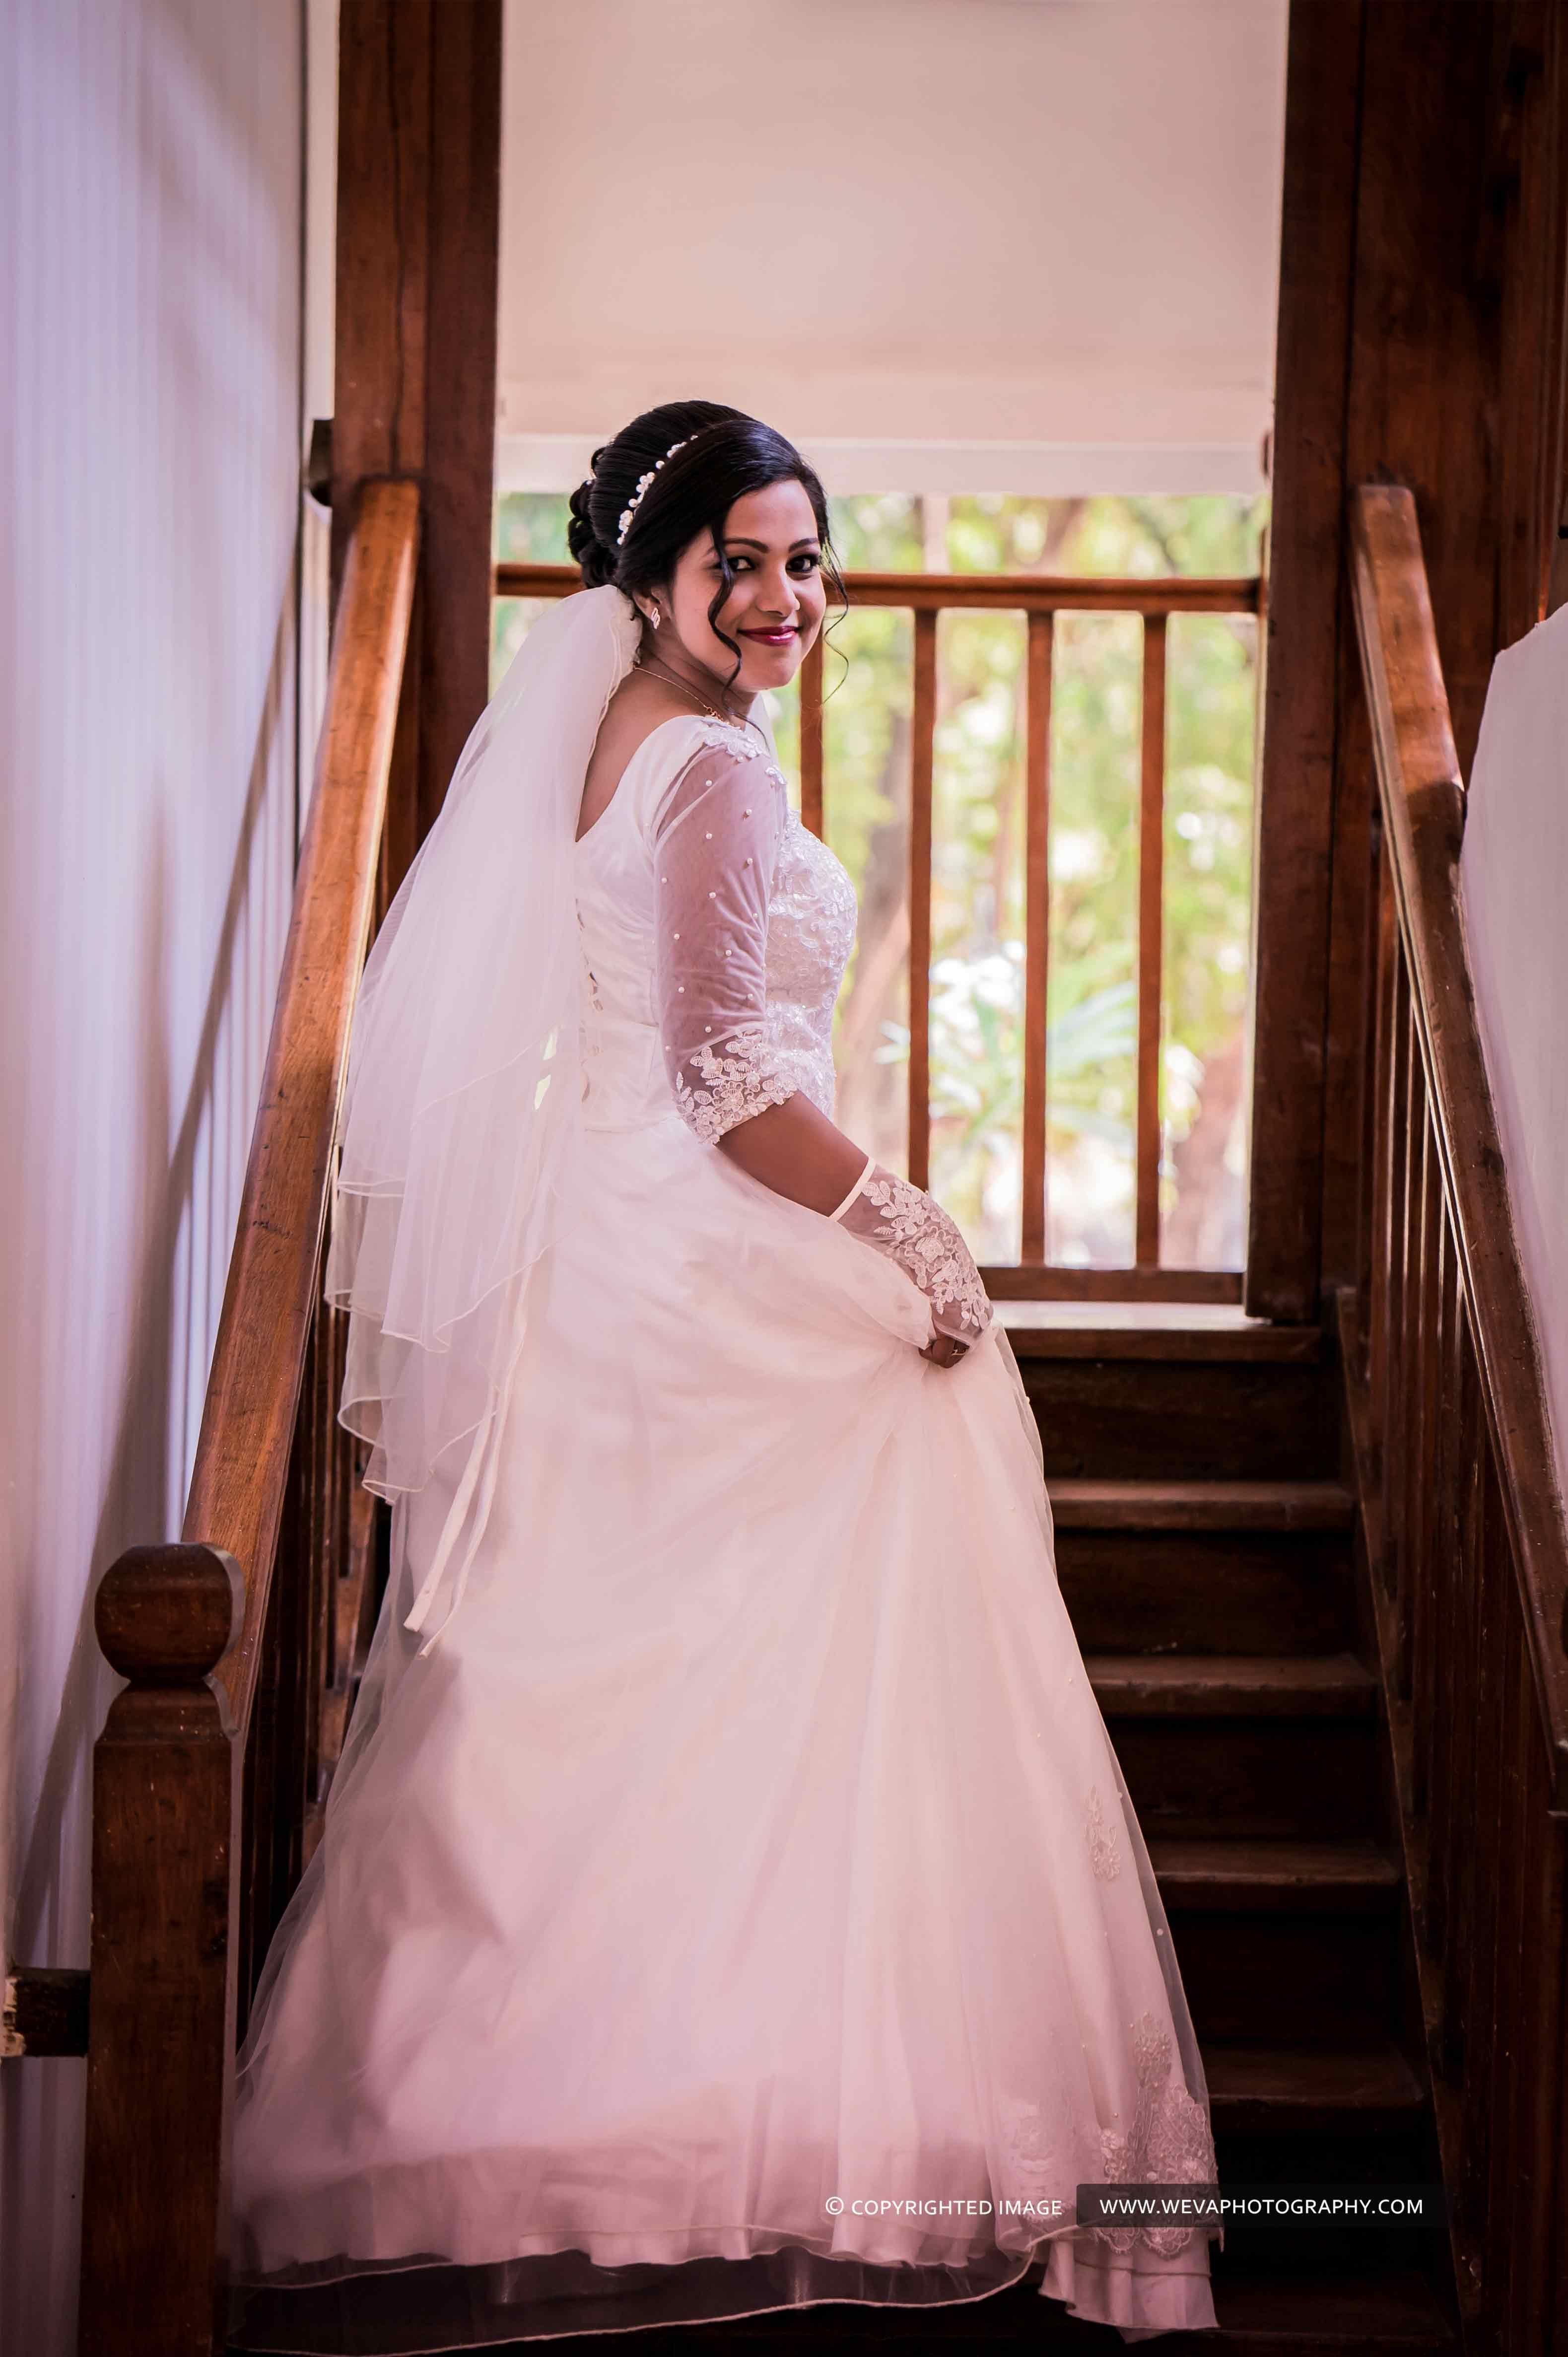 Our Charismatic Christian Bride !!!!! #Christianbride #christianwedding #weddinggown ...